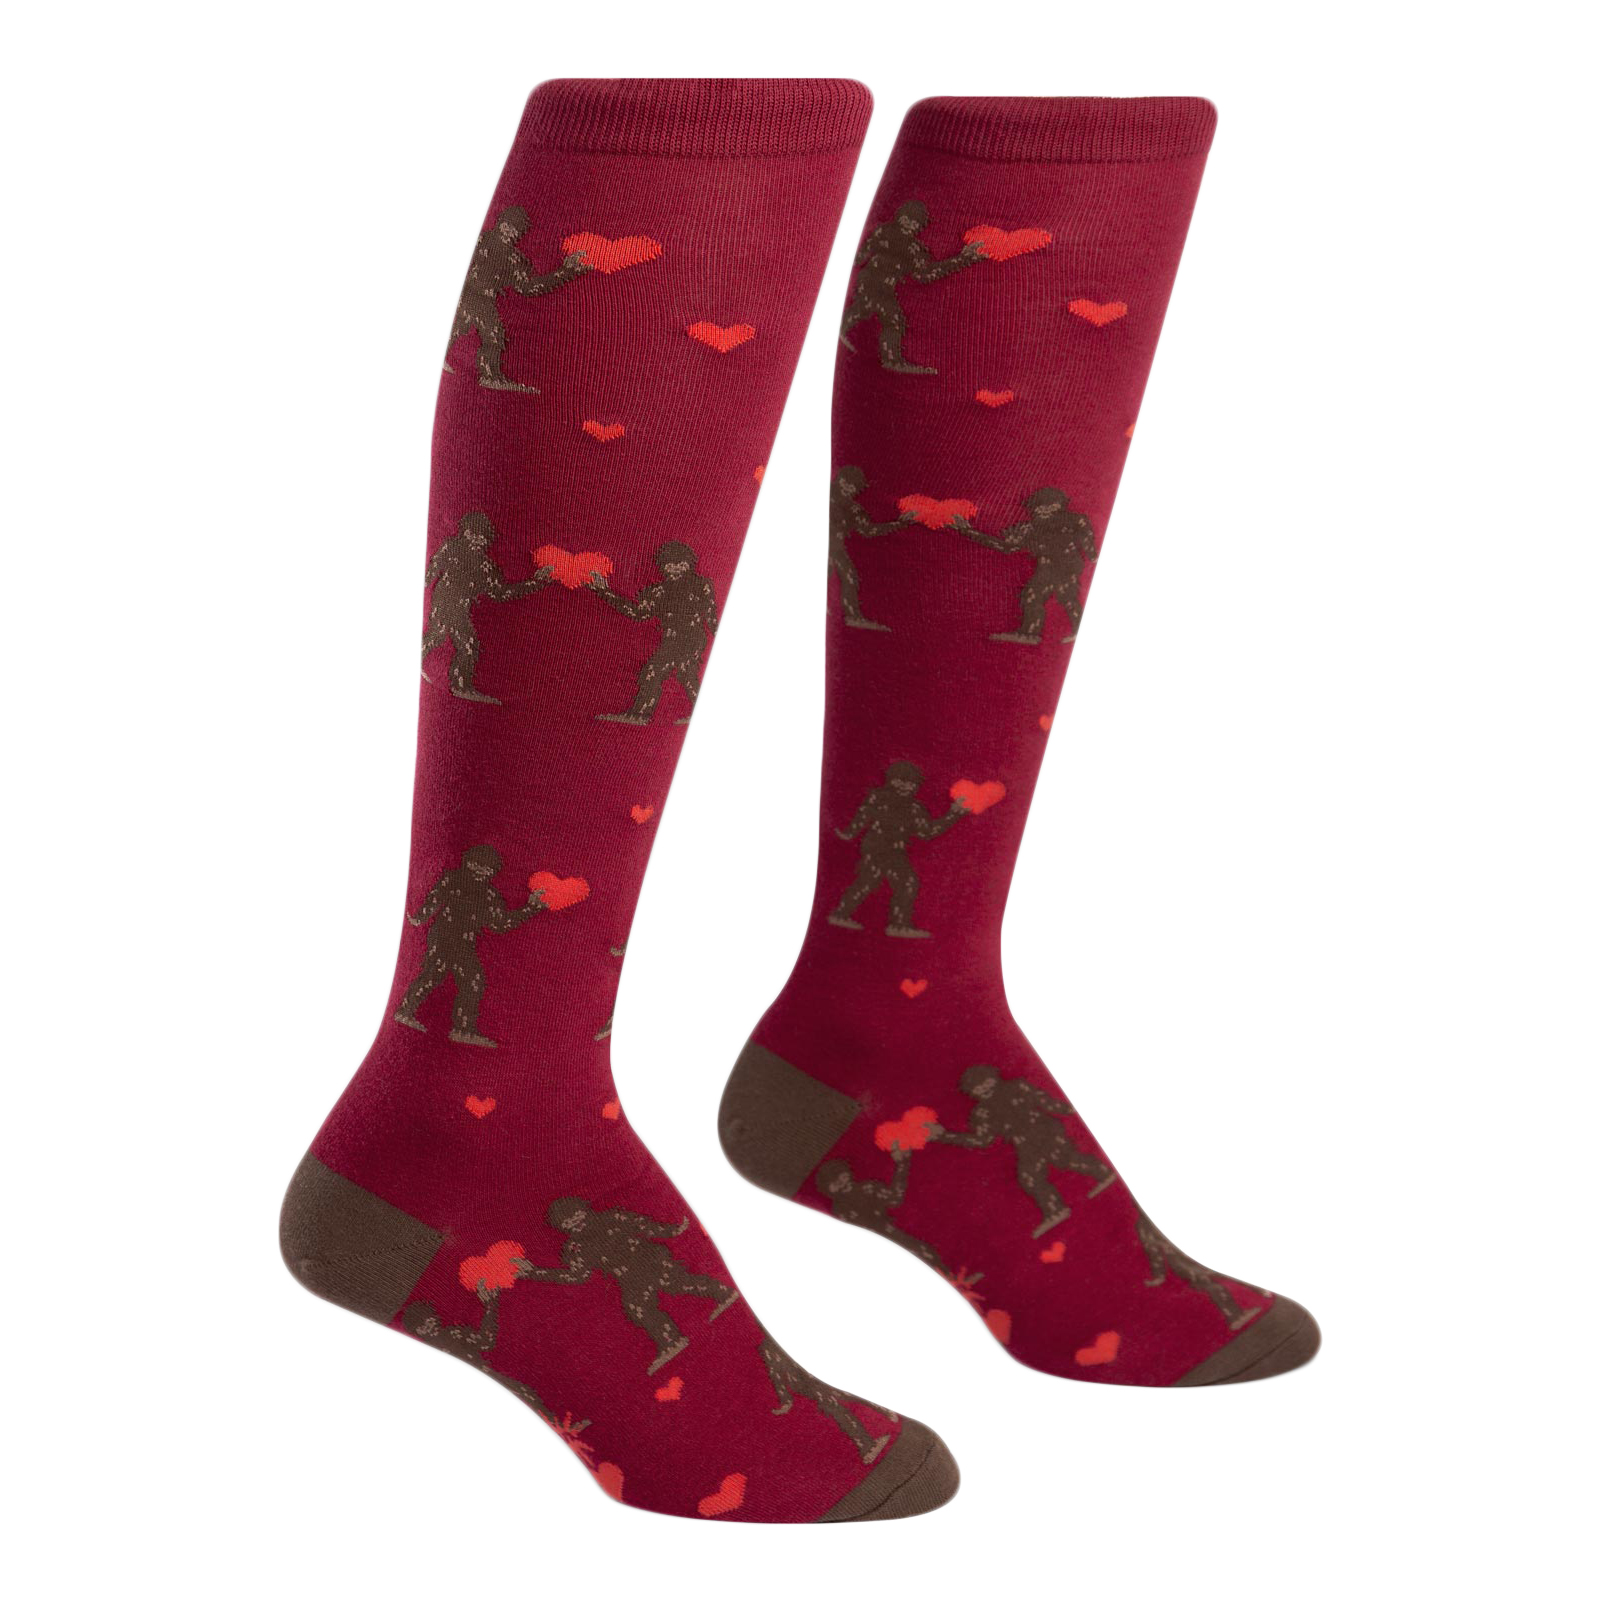 07bdd1ce0 Sock It To Me Sasquatch Valentine Funky Knee High Socks 817196018128 ...